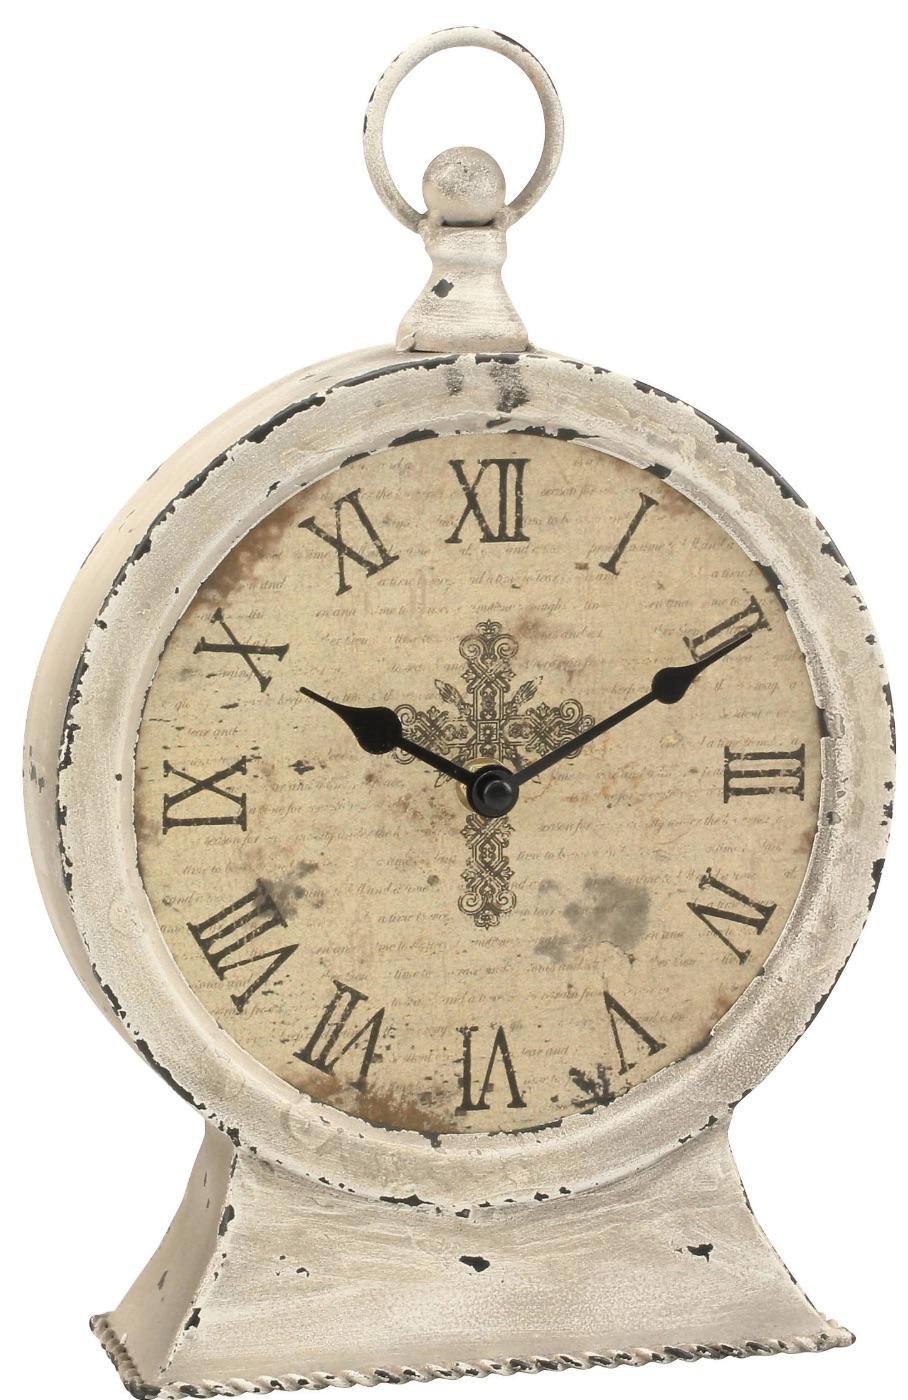 Clocks with Vintage Style Faith Round Tabletop Clock #Clocks #MantleClocks #Timepiece #TableTopDecor #Decor